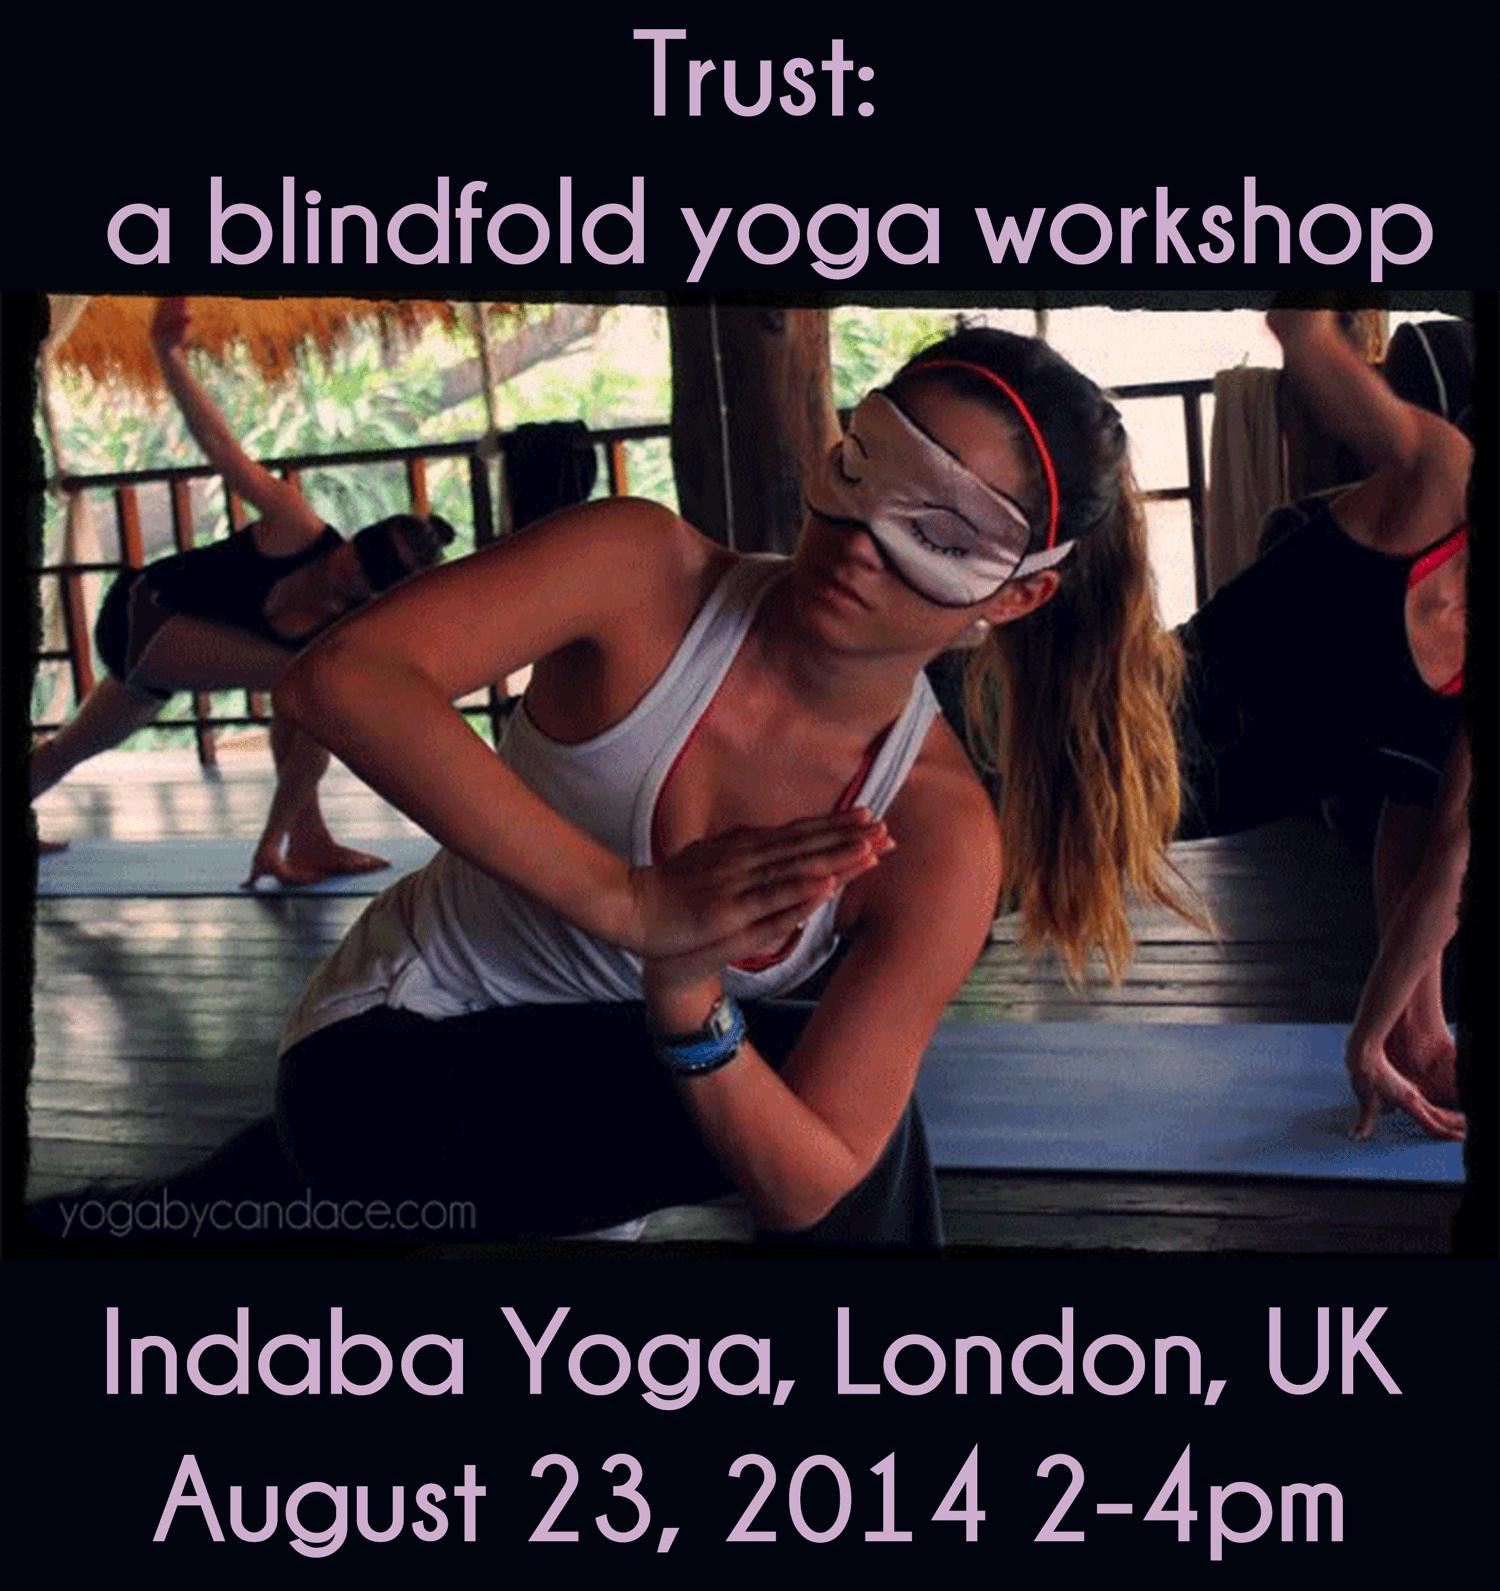 Trust: Blindfolded yoga workshop .